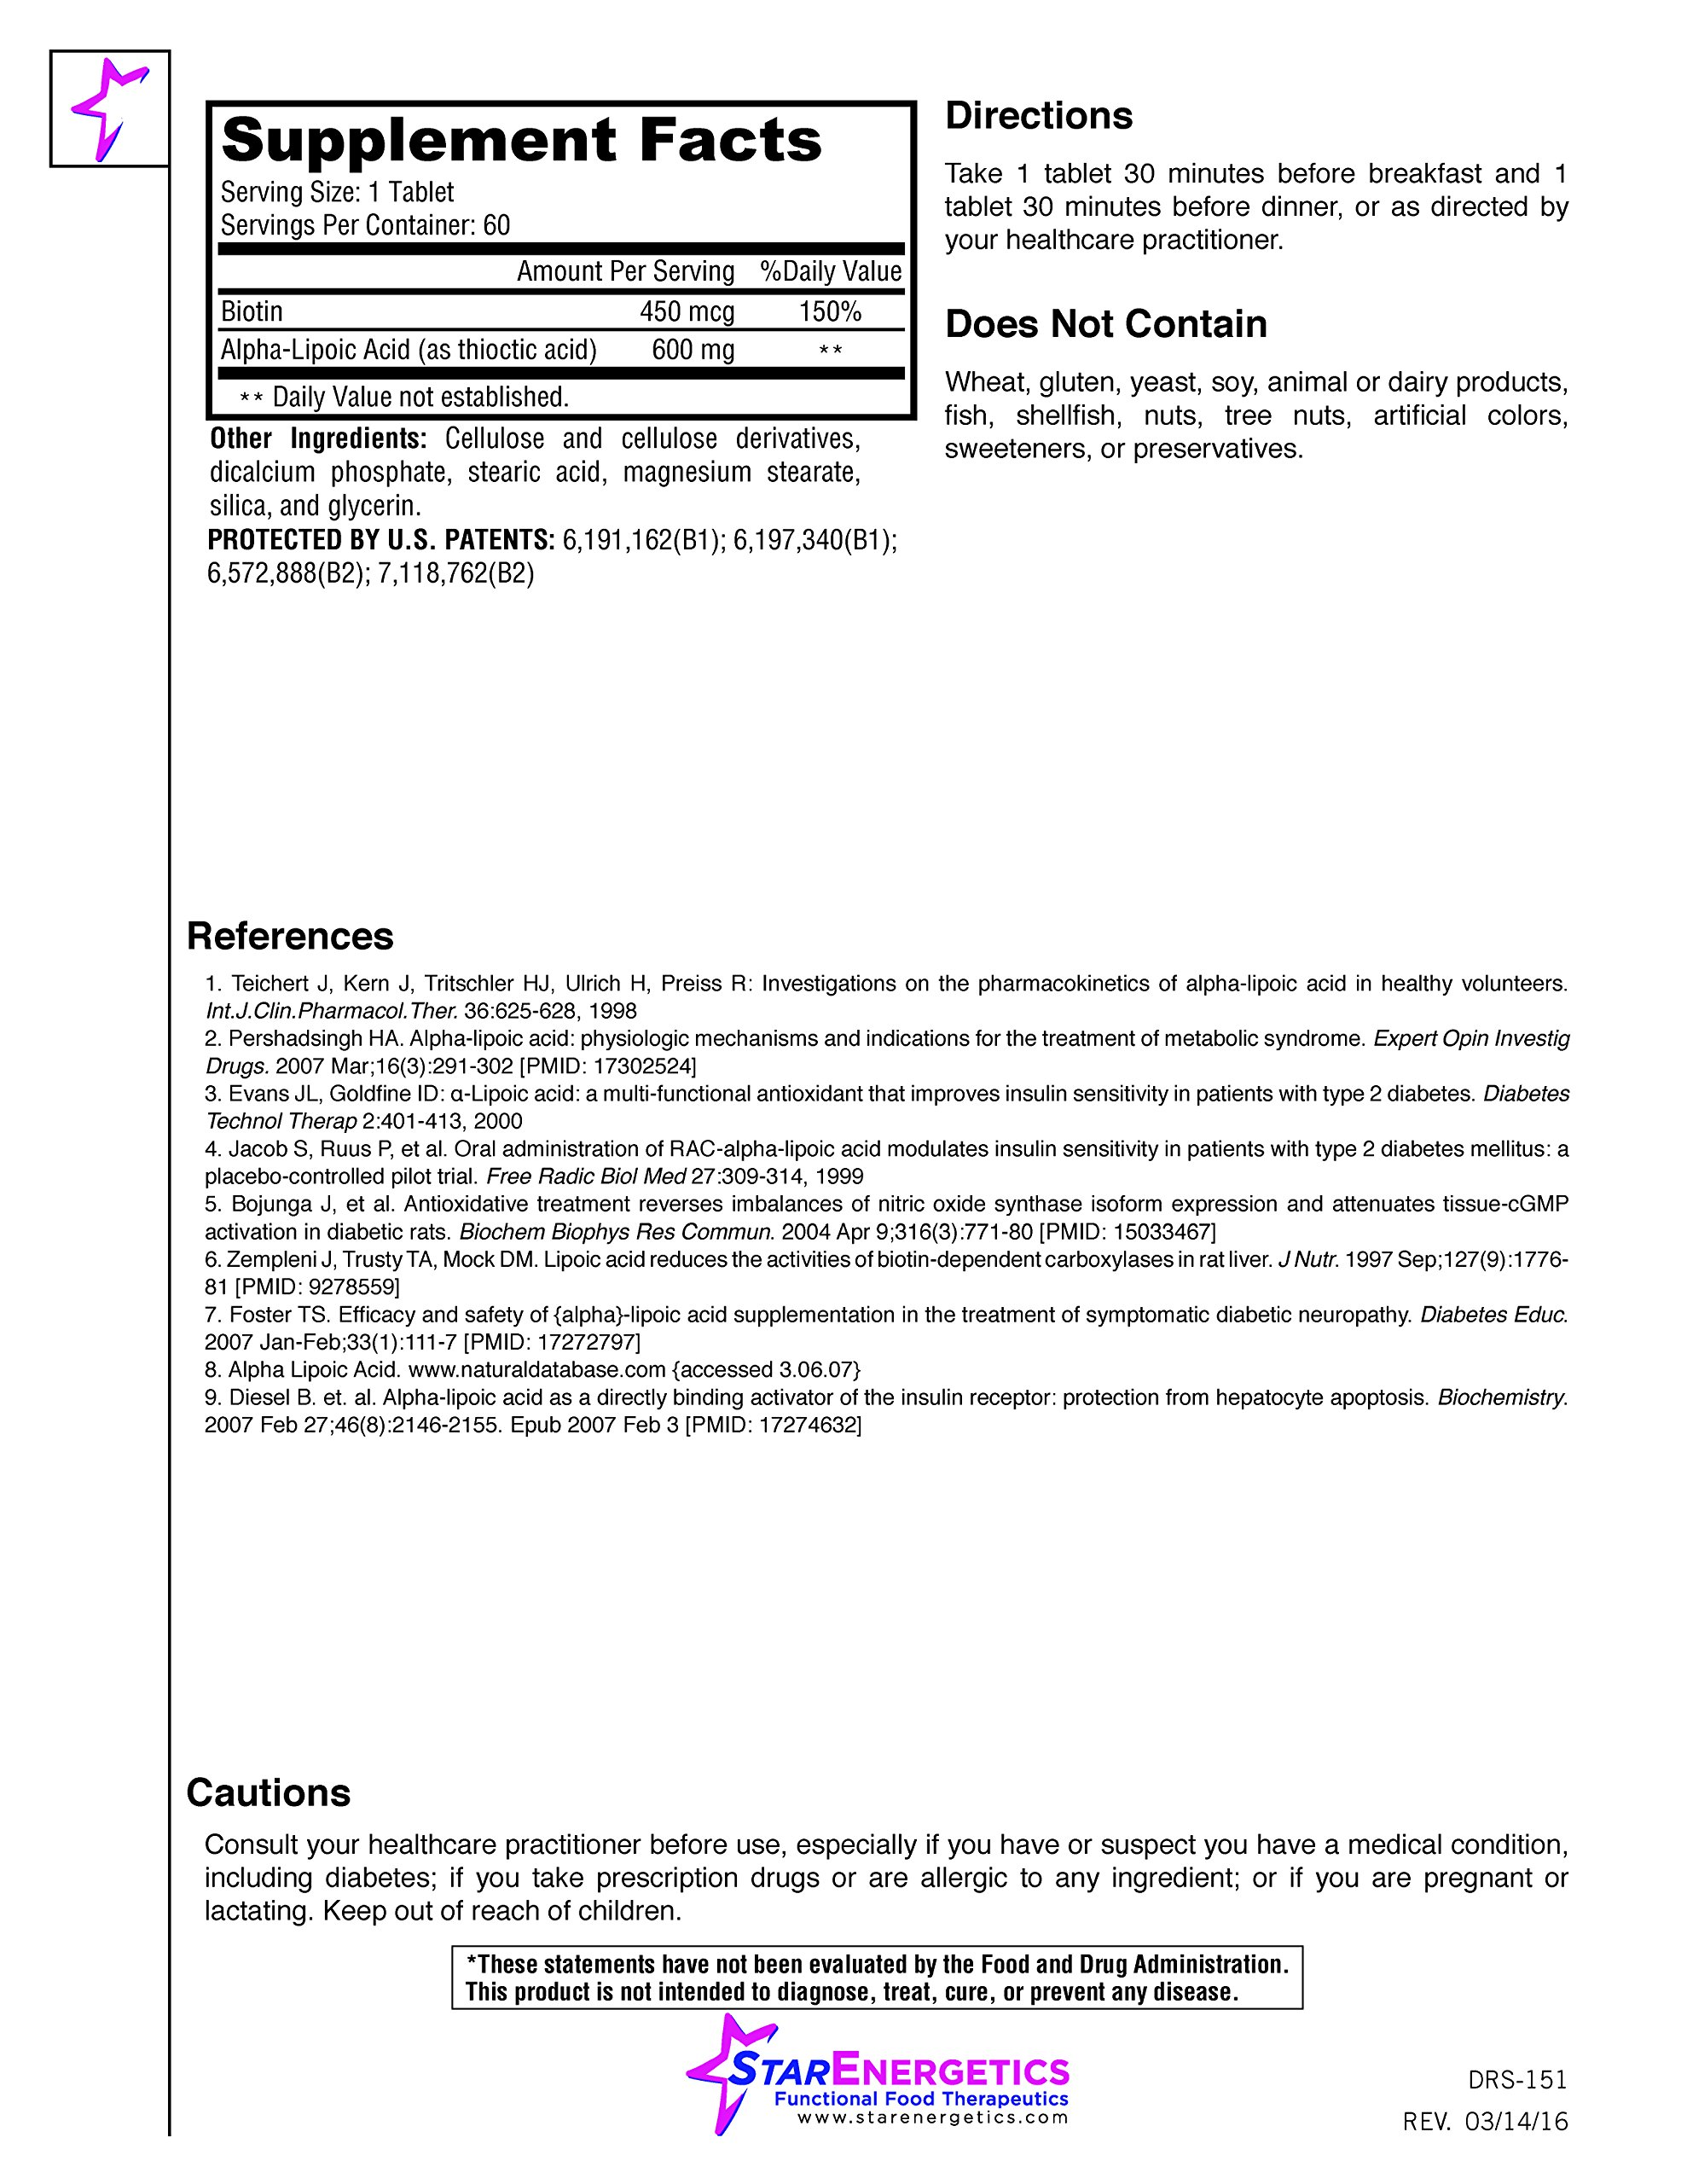 Alpha Lipoic Acid - Gluco-Recharge 60 Tablets 600mg, Biotin 450mcg, Controlled-Release, Gluten Free, cGMP, Blood Sugar Control